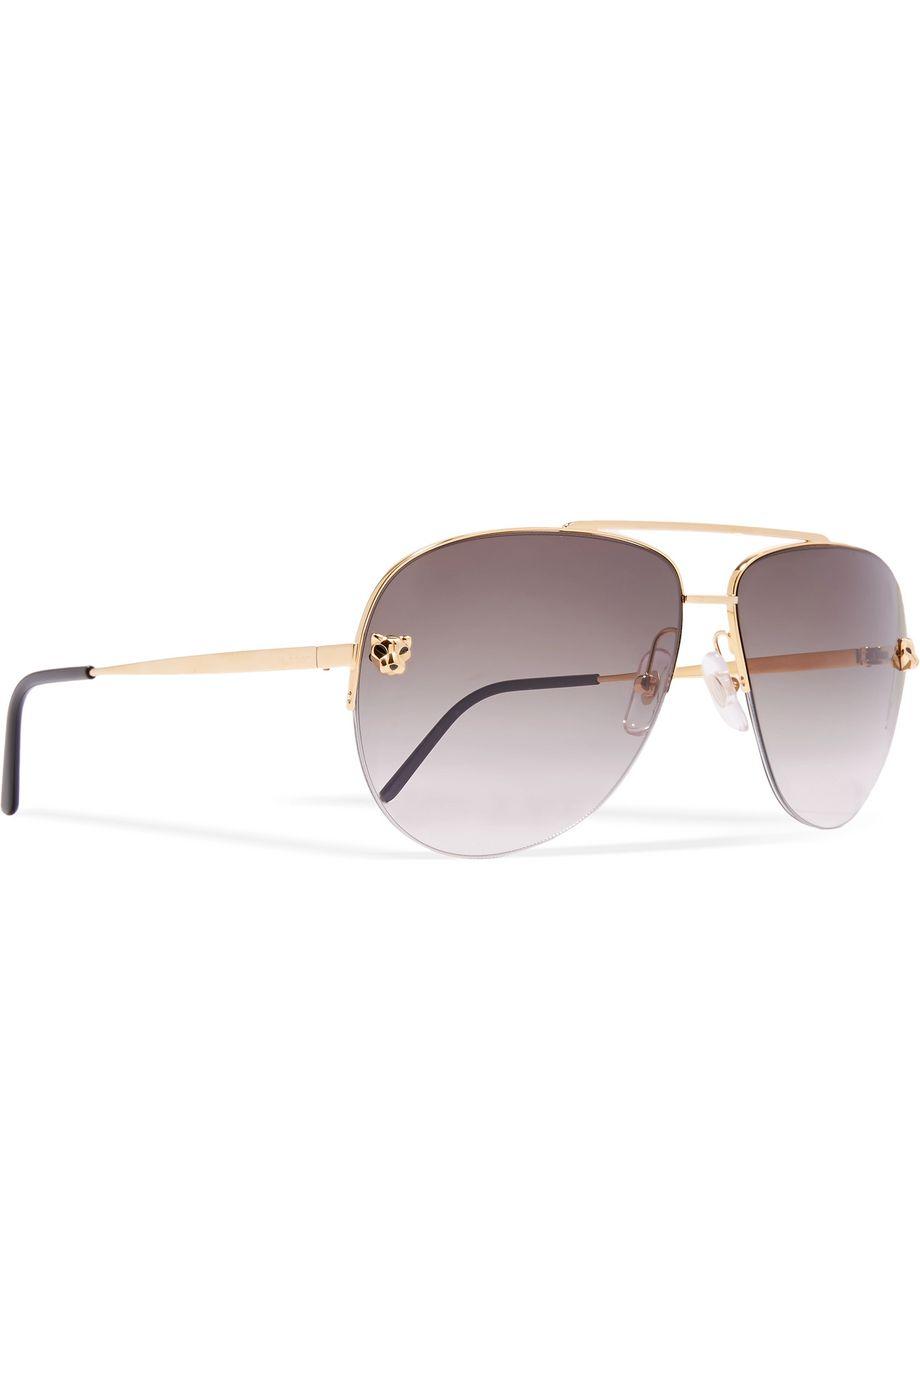 Cartier Eyewear Panthère aviator-style gold-plated sunglasses